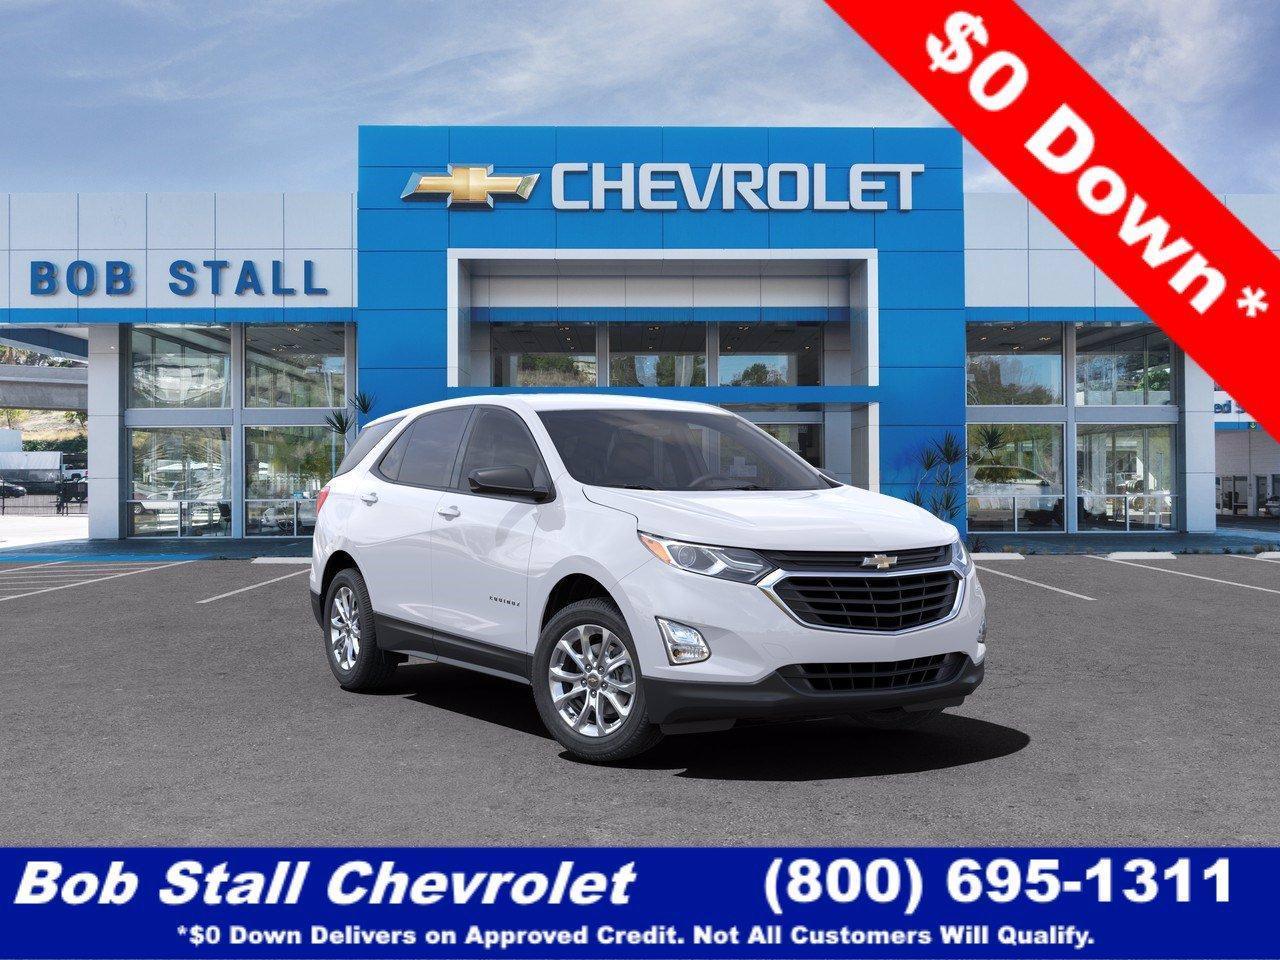 2021 Chevrolet Equinox Vehicle Photo in La Mesa, CA 91942